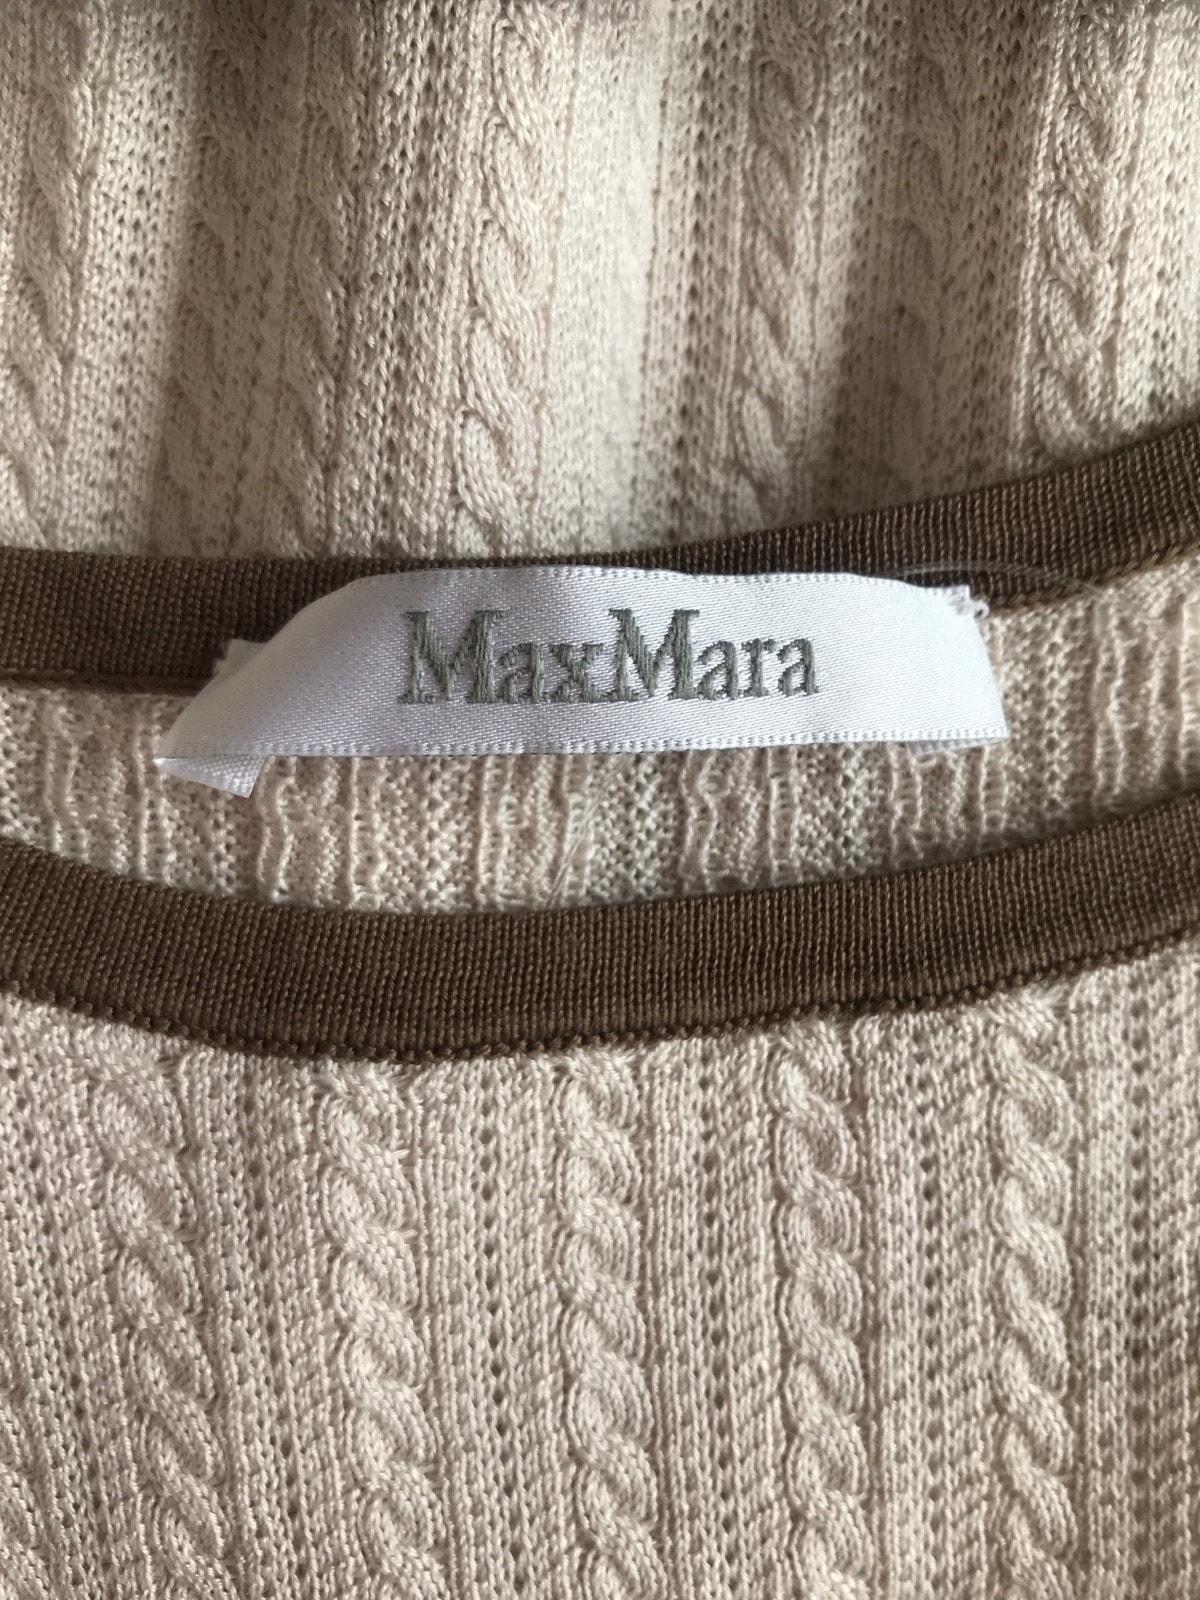 Max Mara(マックスマーラ)のタンクトップ